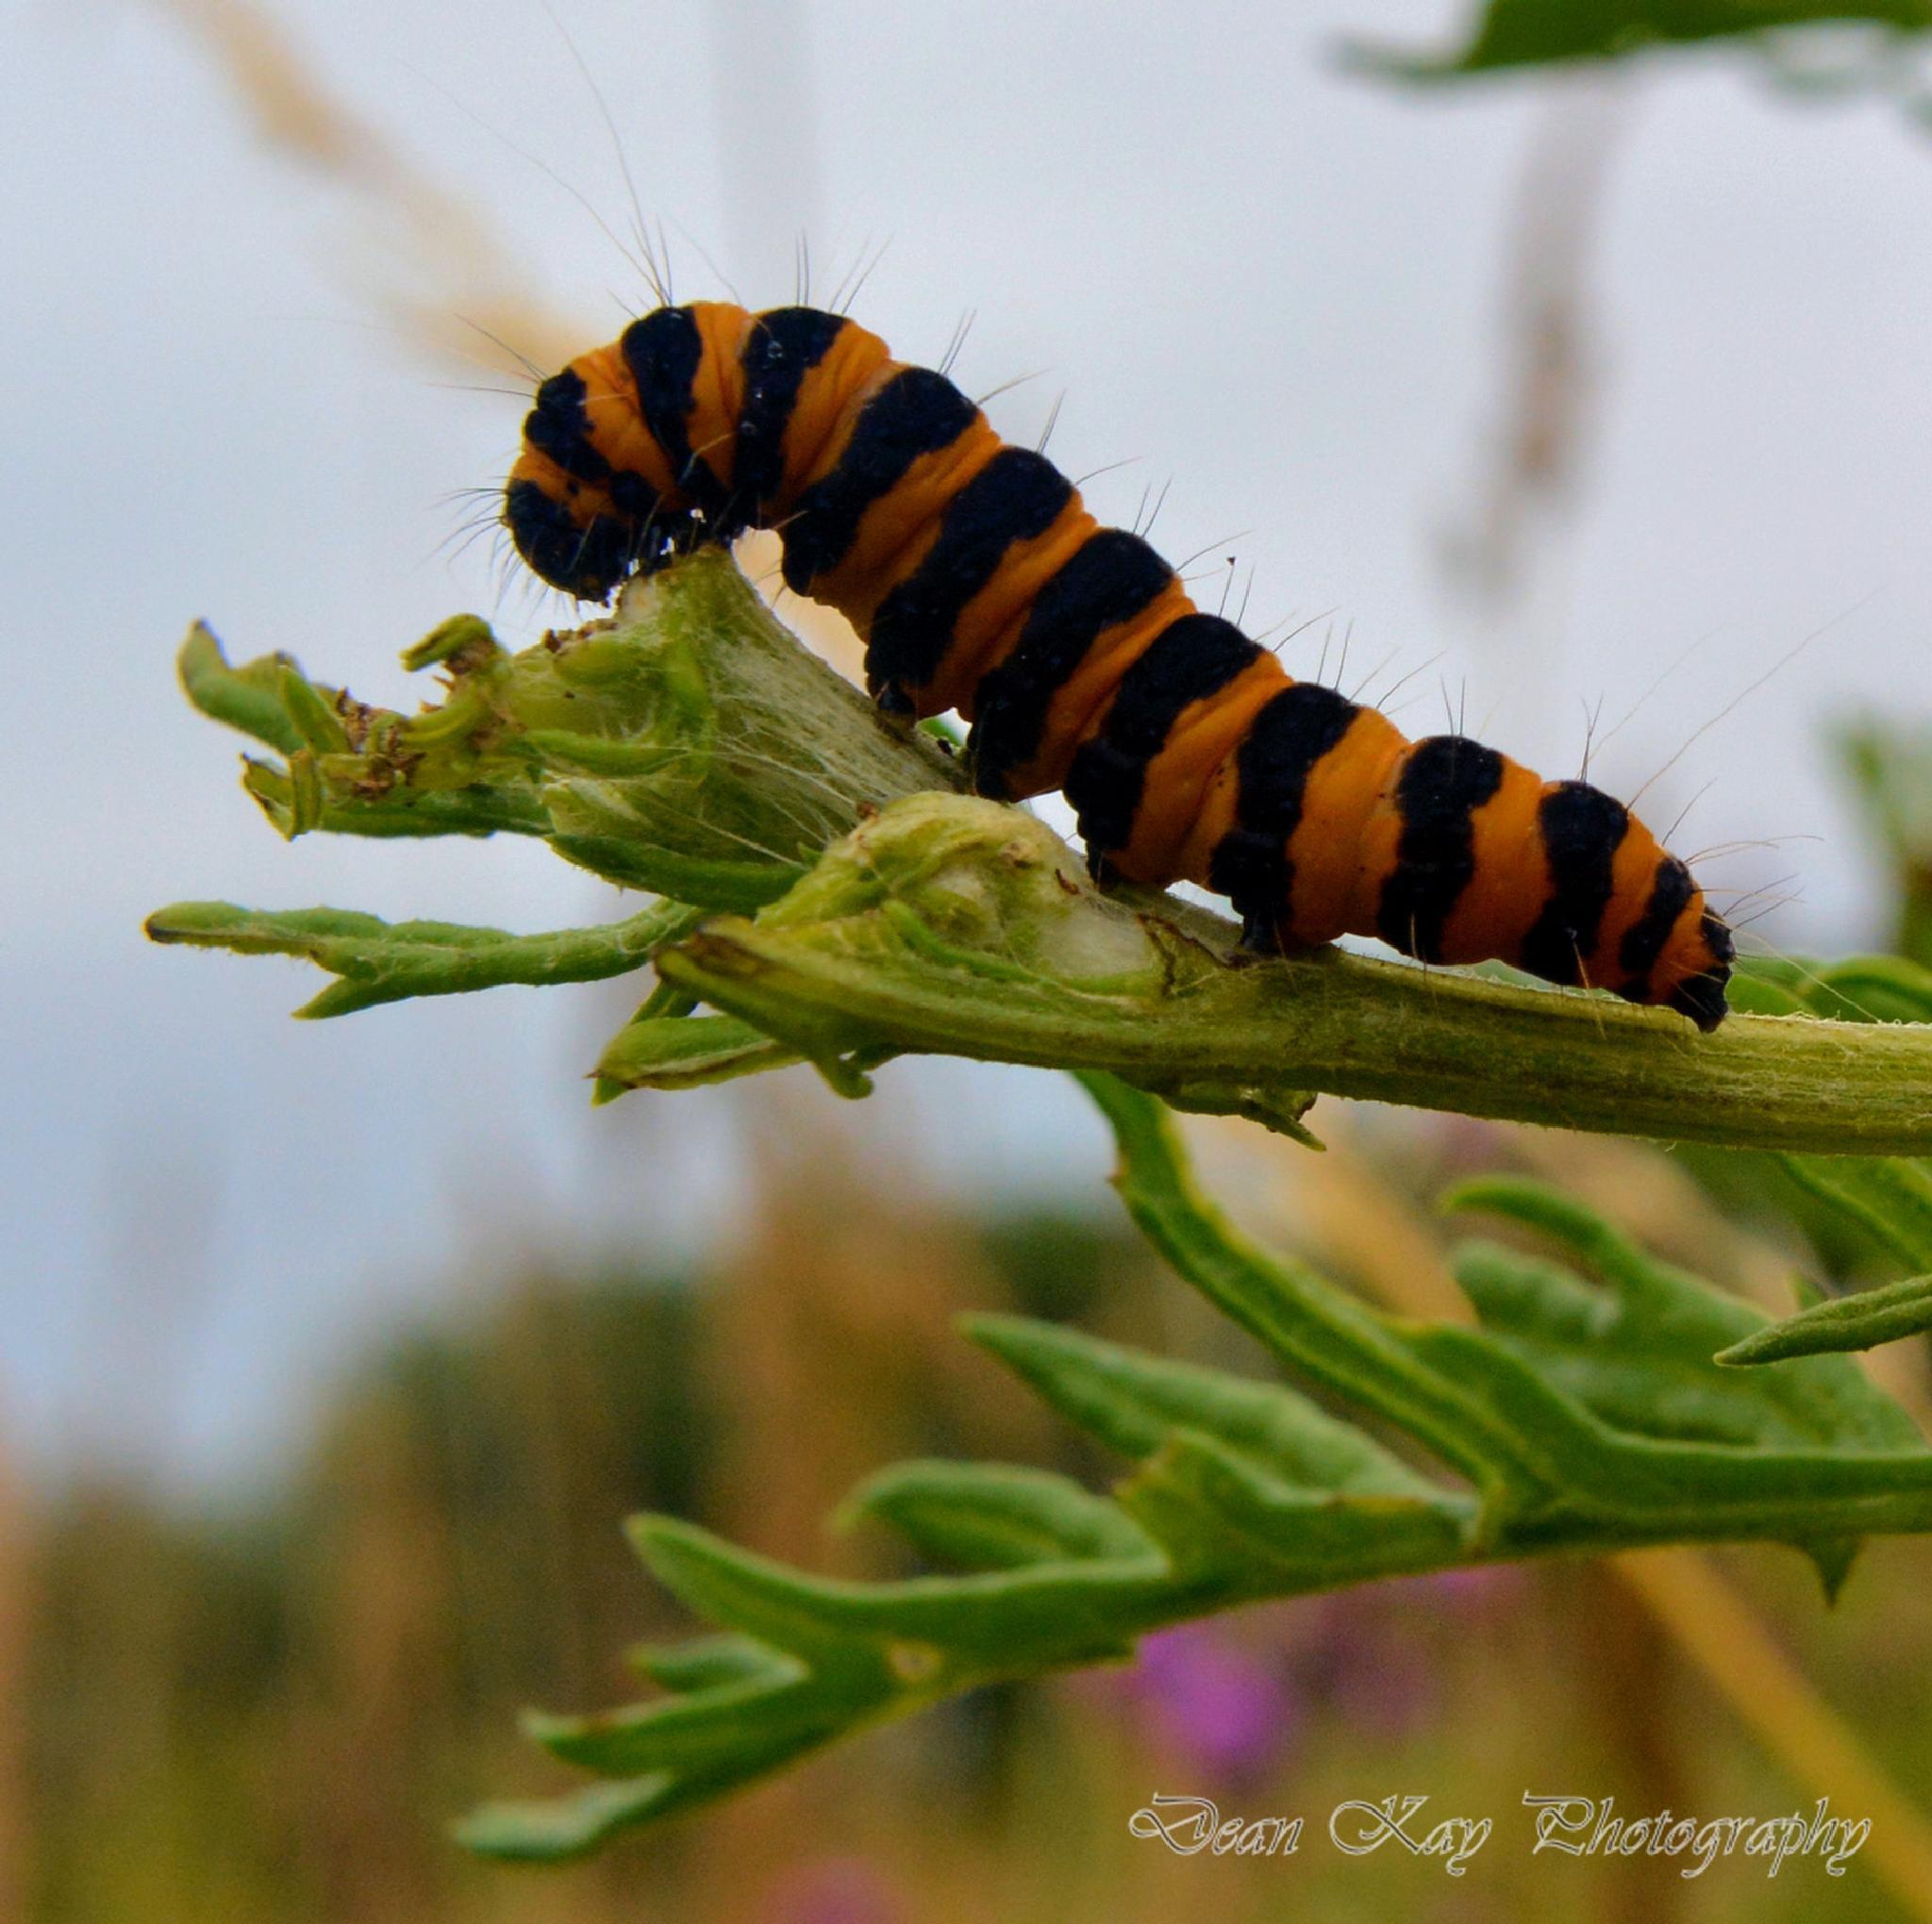 fatterpillar by Dean kay